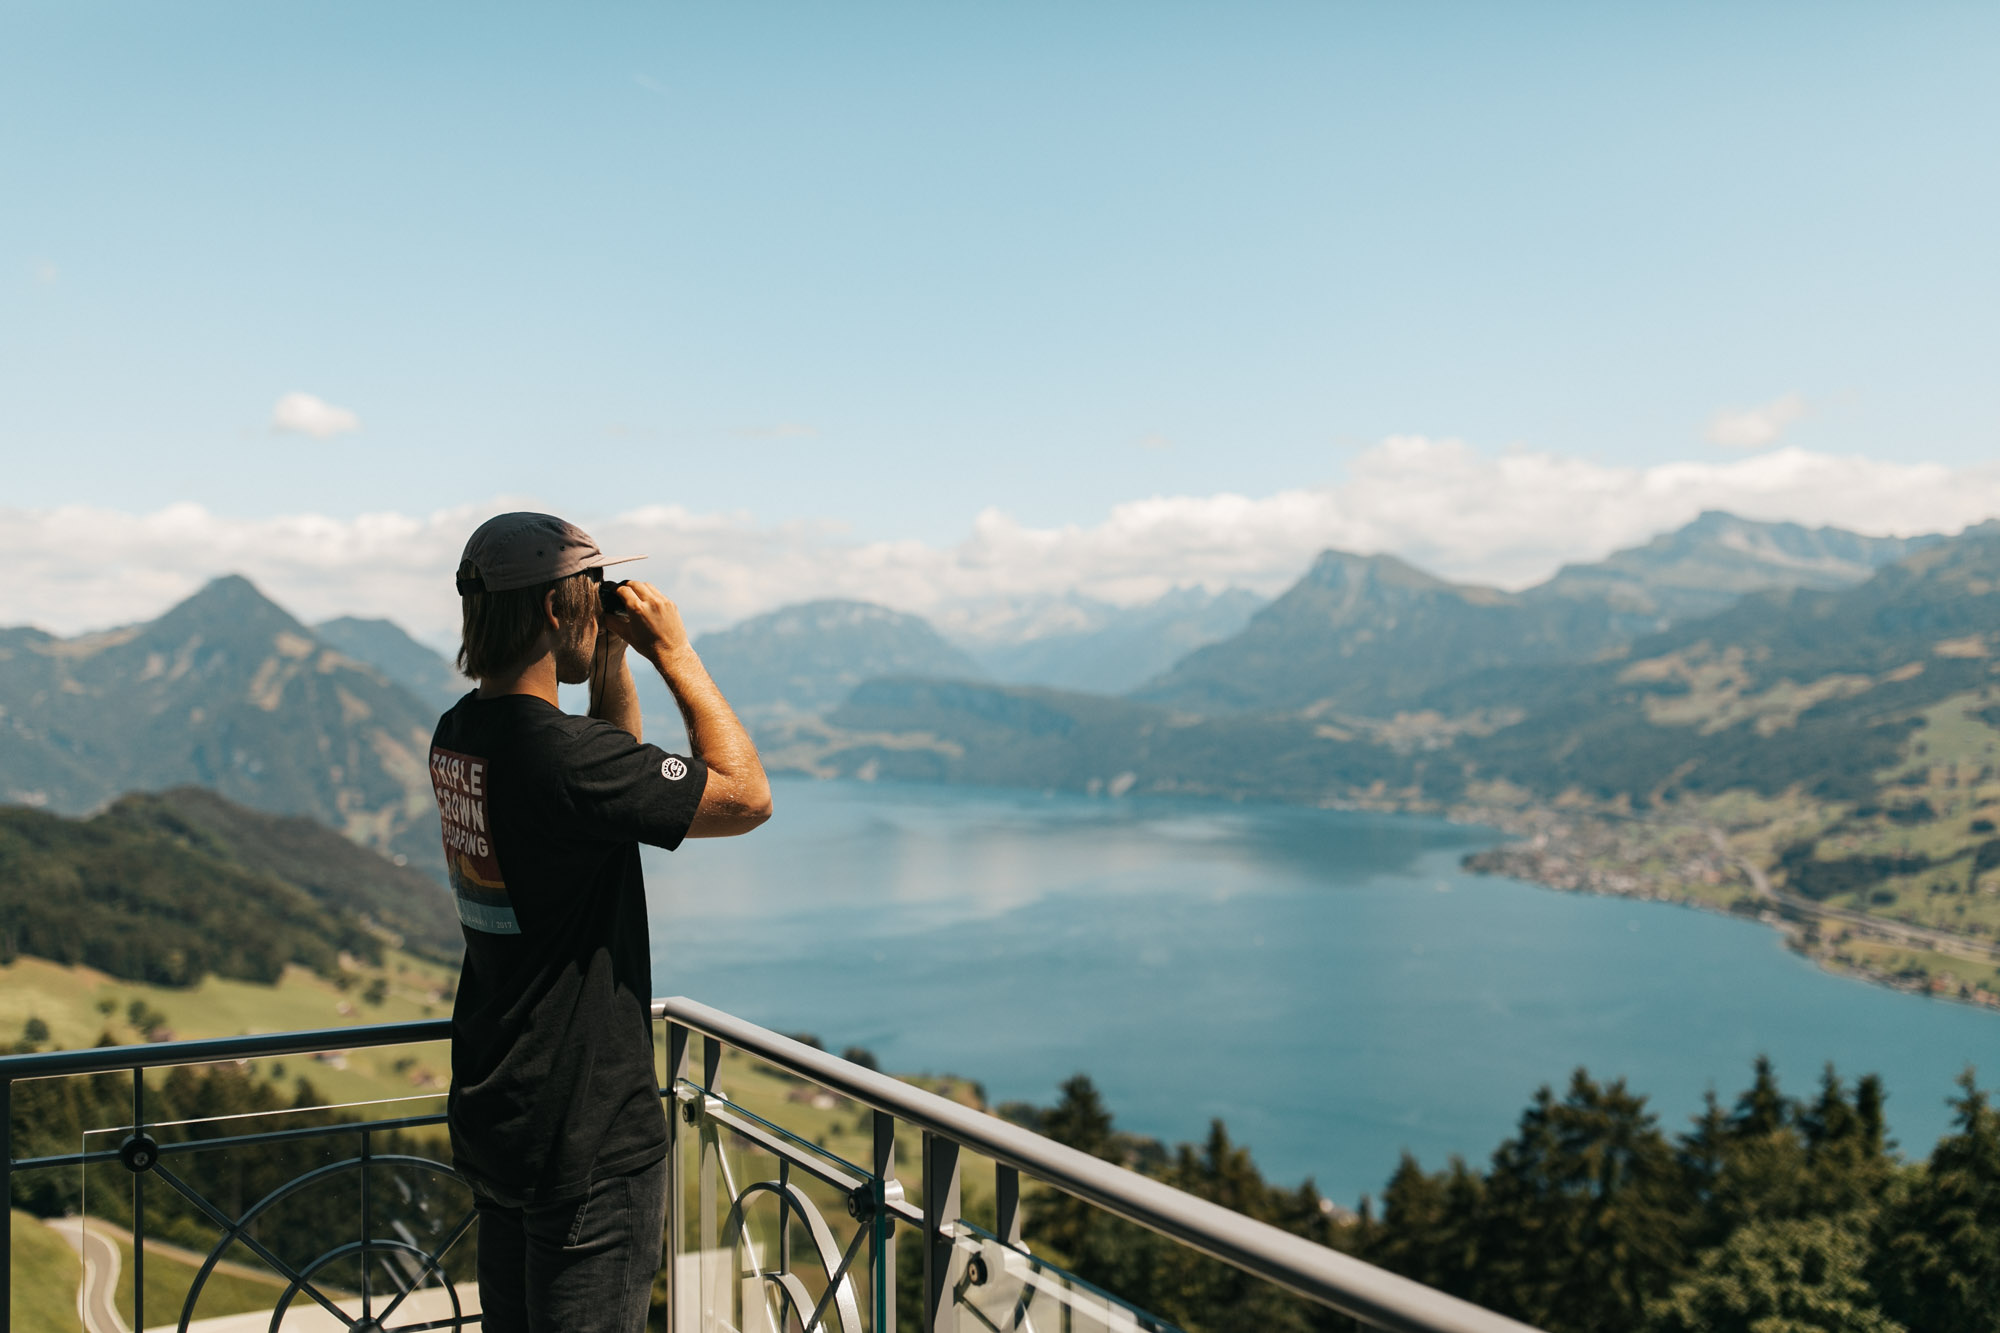 SwitzerlandBlog_HBGOODIE2018 (43 of 58).jpg